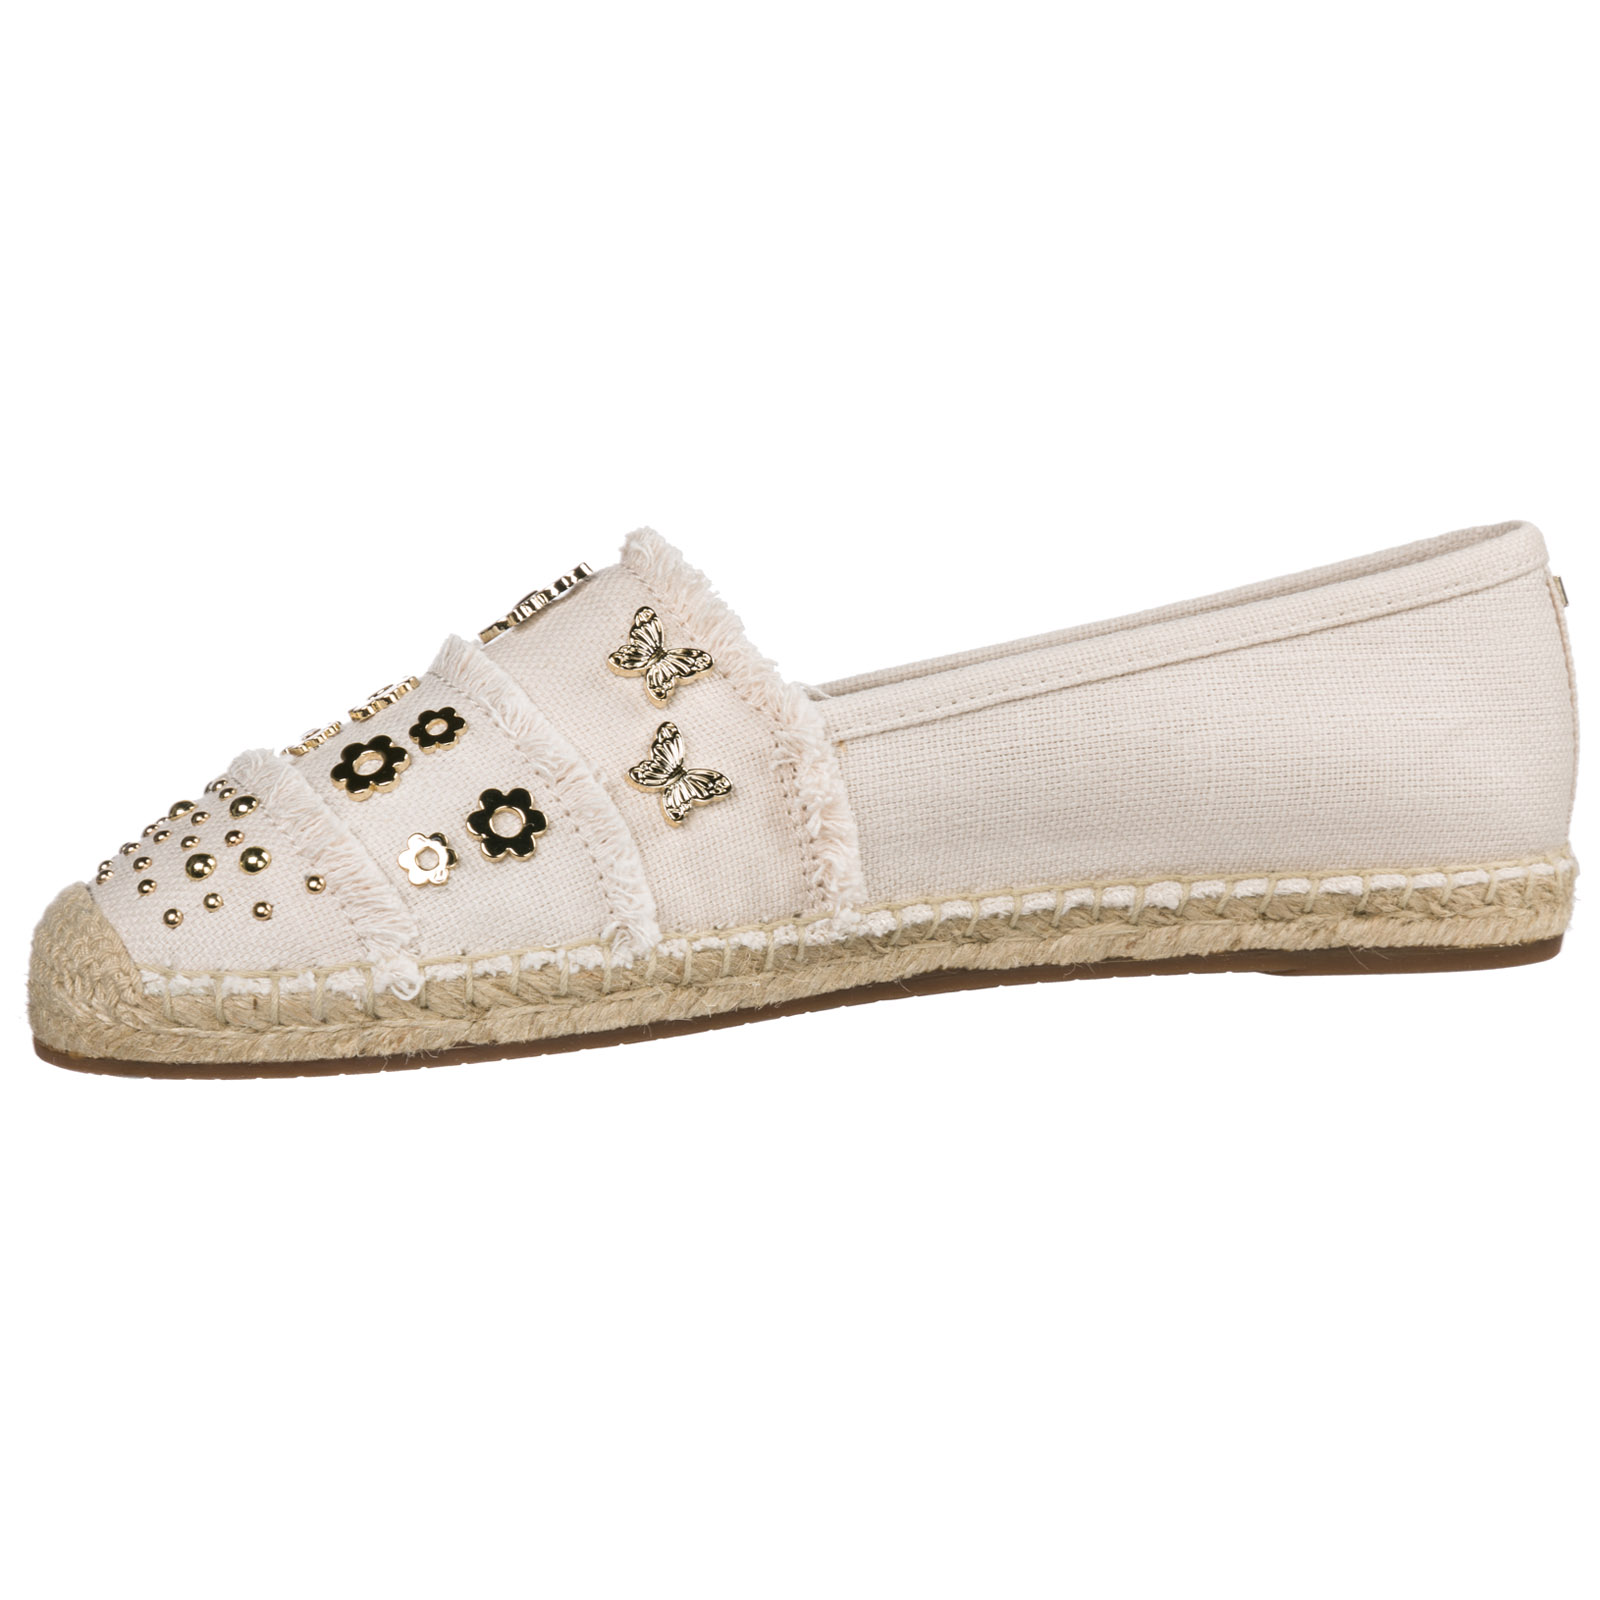 Women's cotton espadrilles slip on shoes tibby